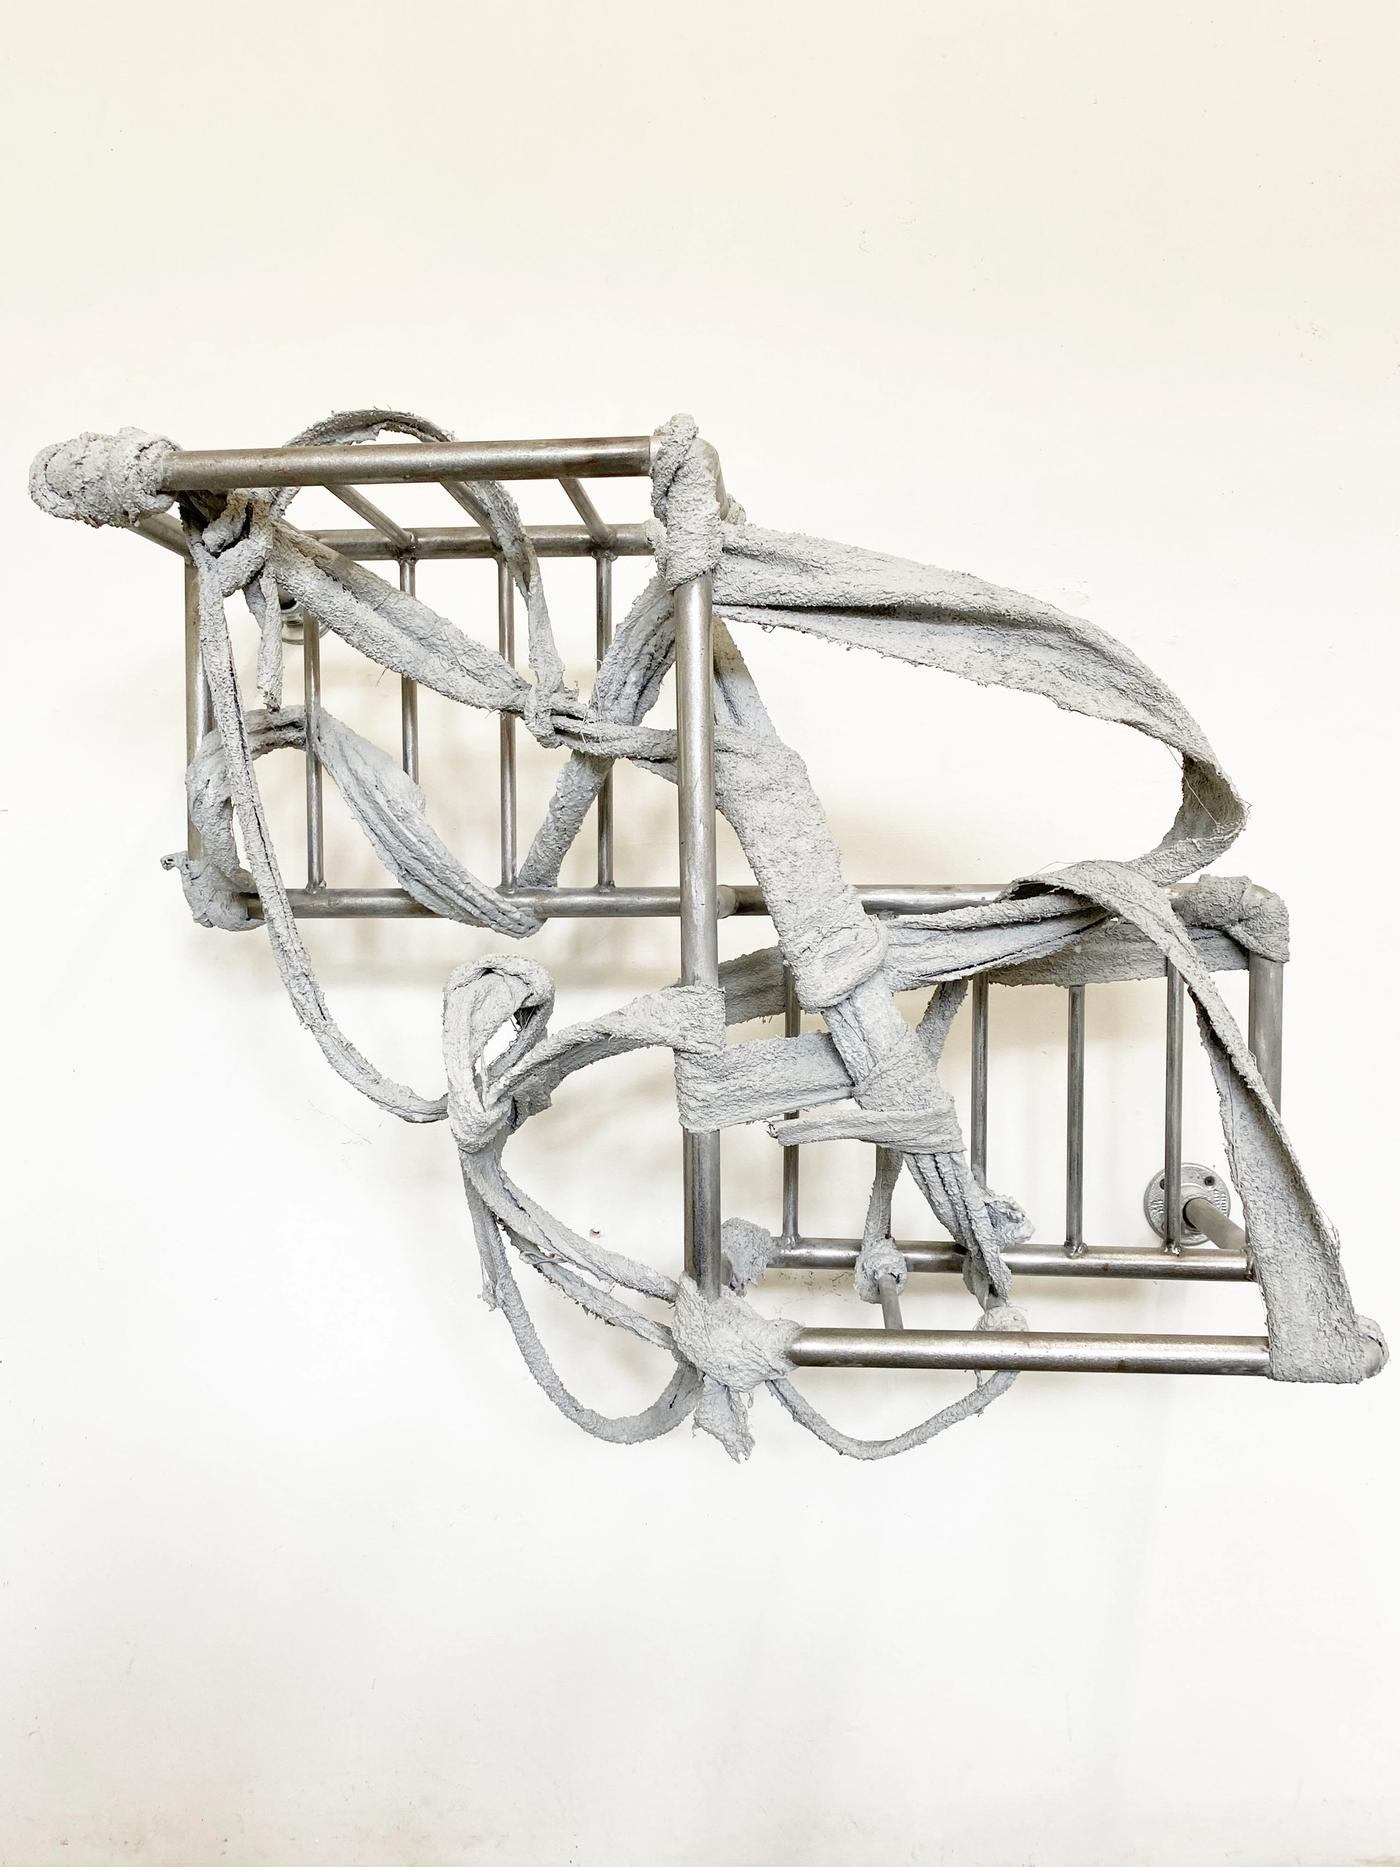 Image of RUINER III, 2020: Steel, towel, plaster